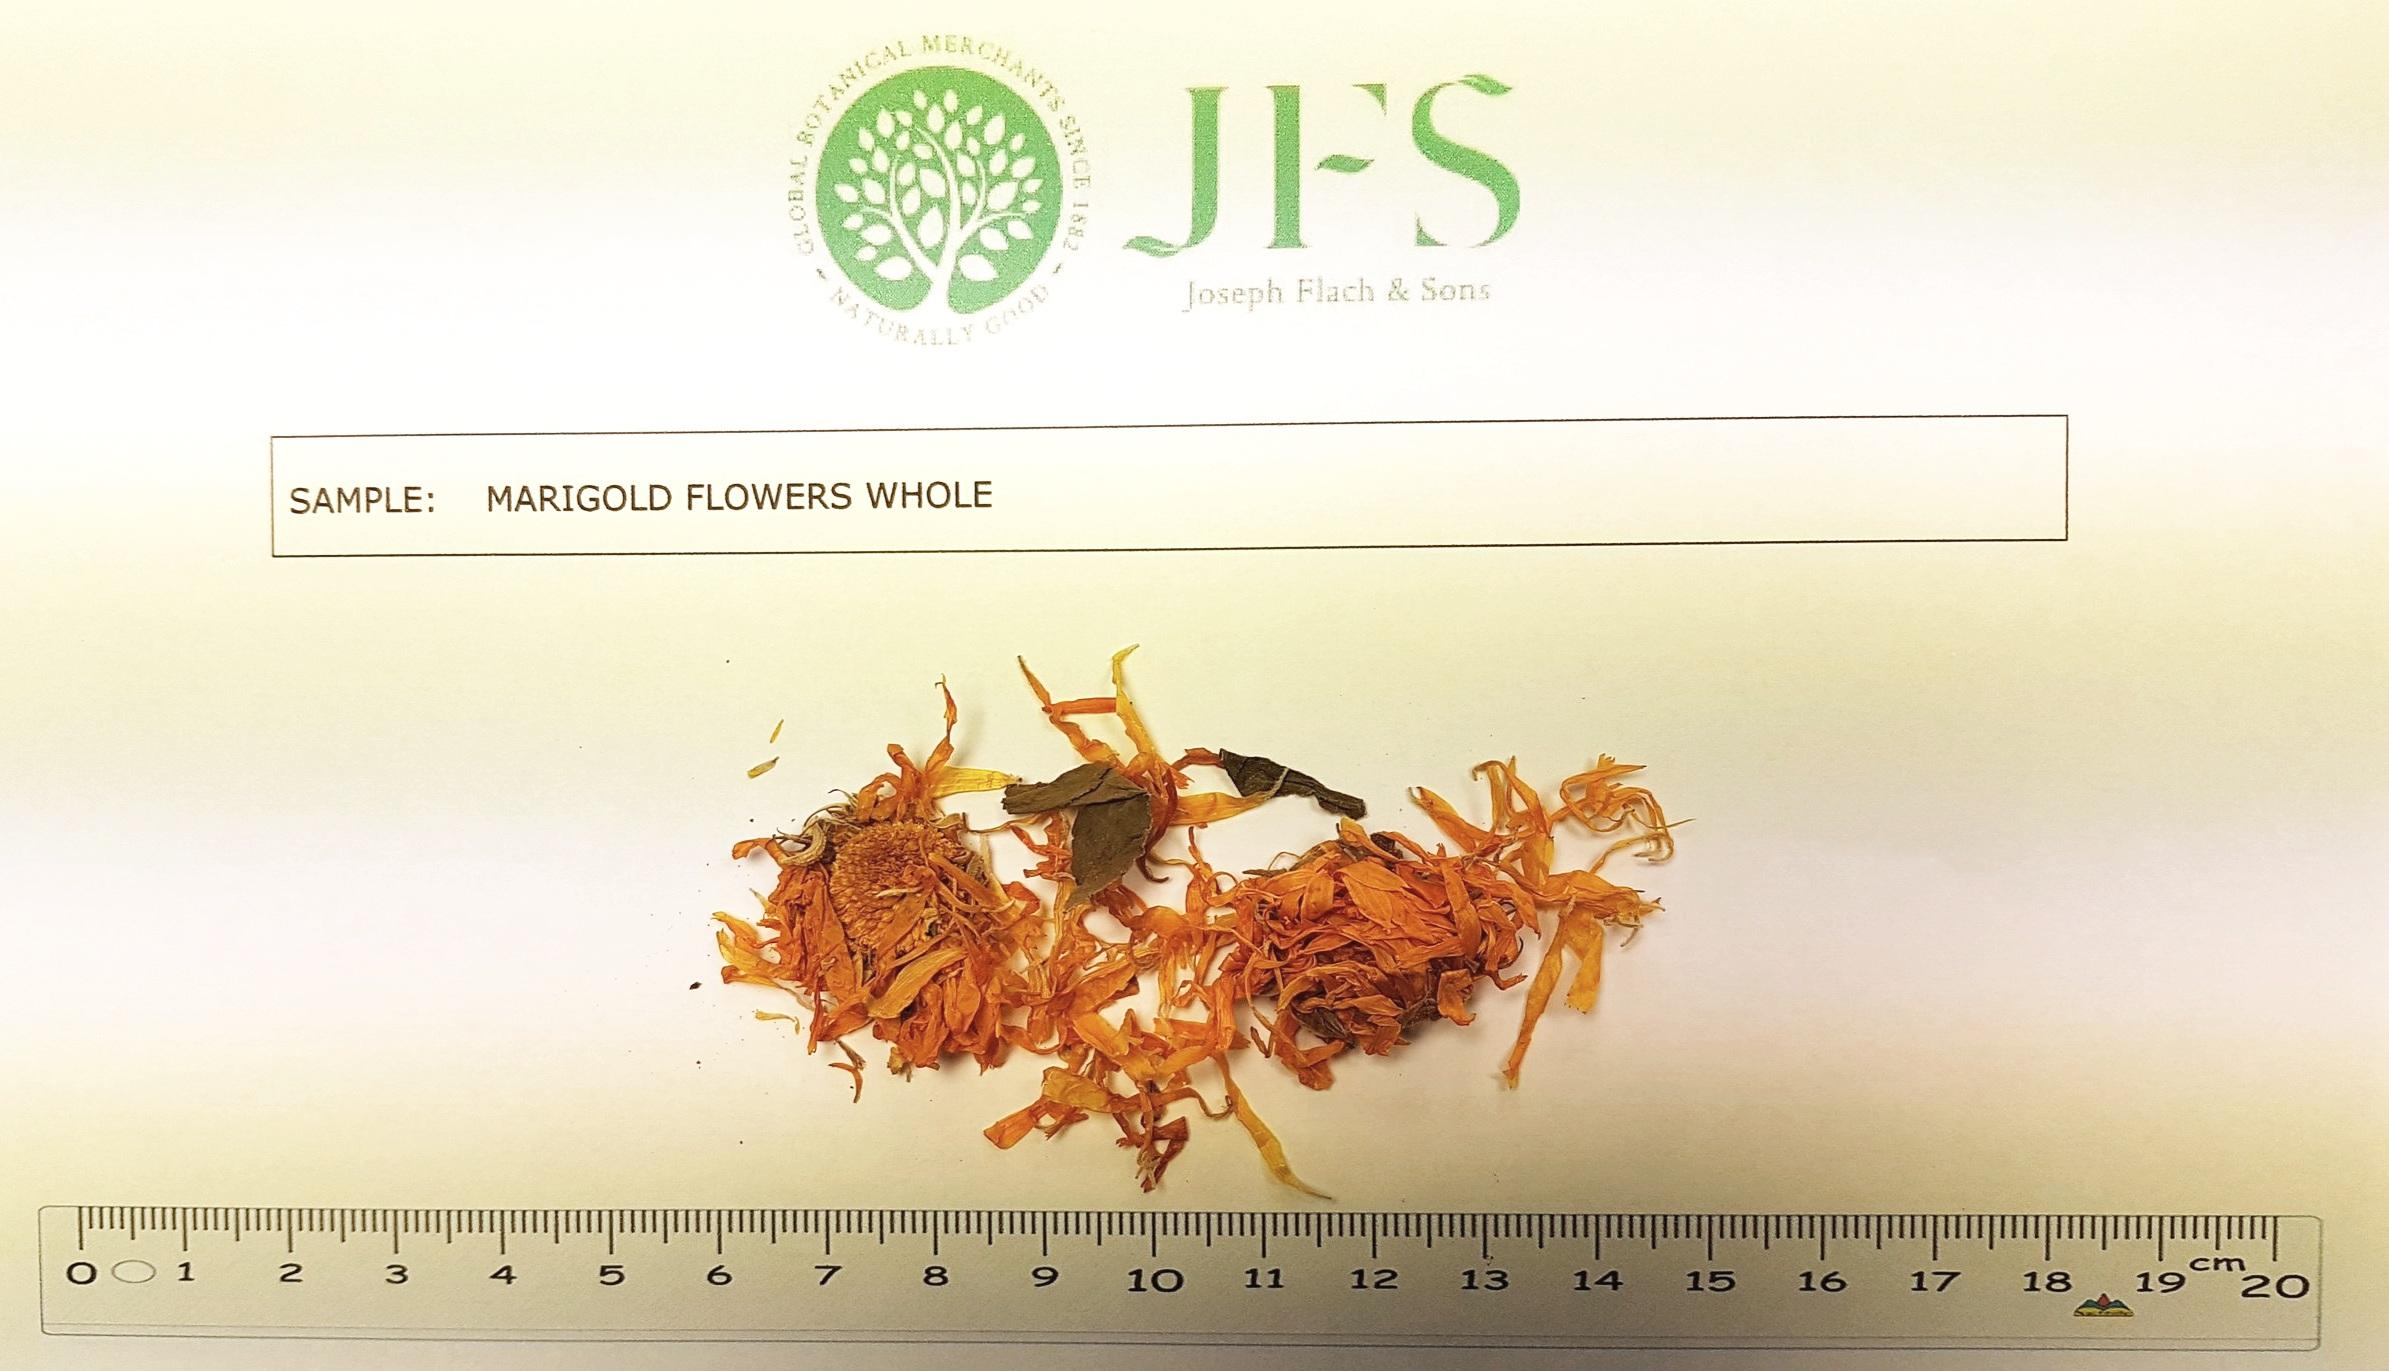 marigold+flowers+whole+JFS+sample.jpg